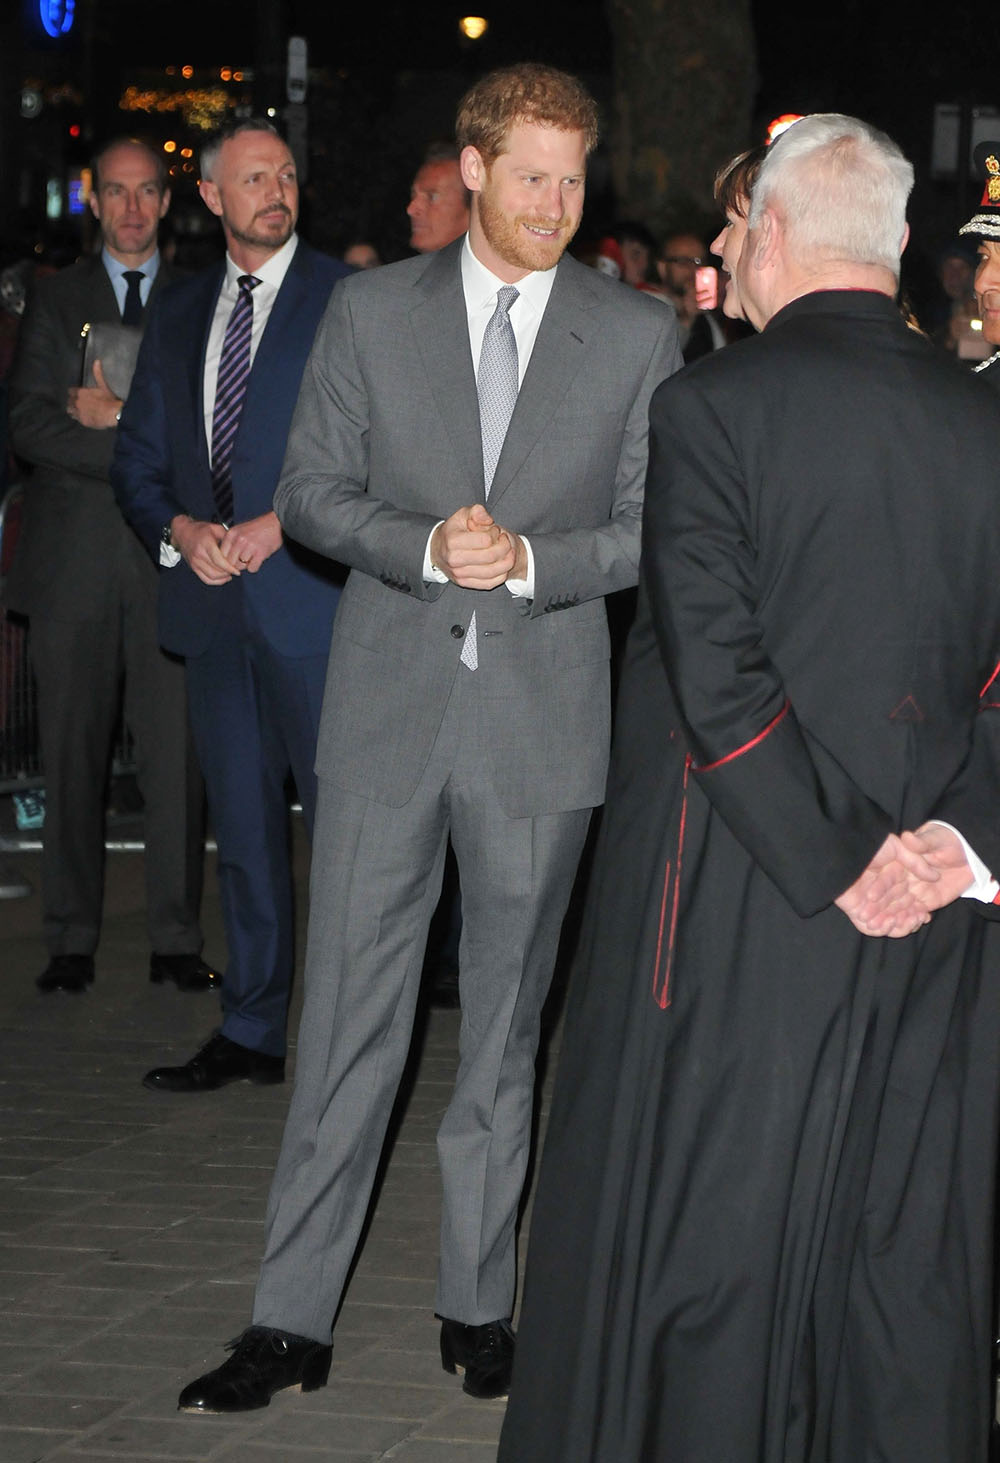 Prince Harry at the London Fire Brigade Carol Service